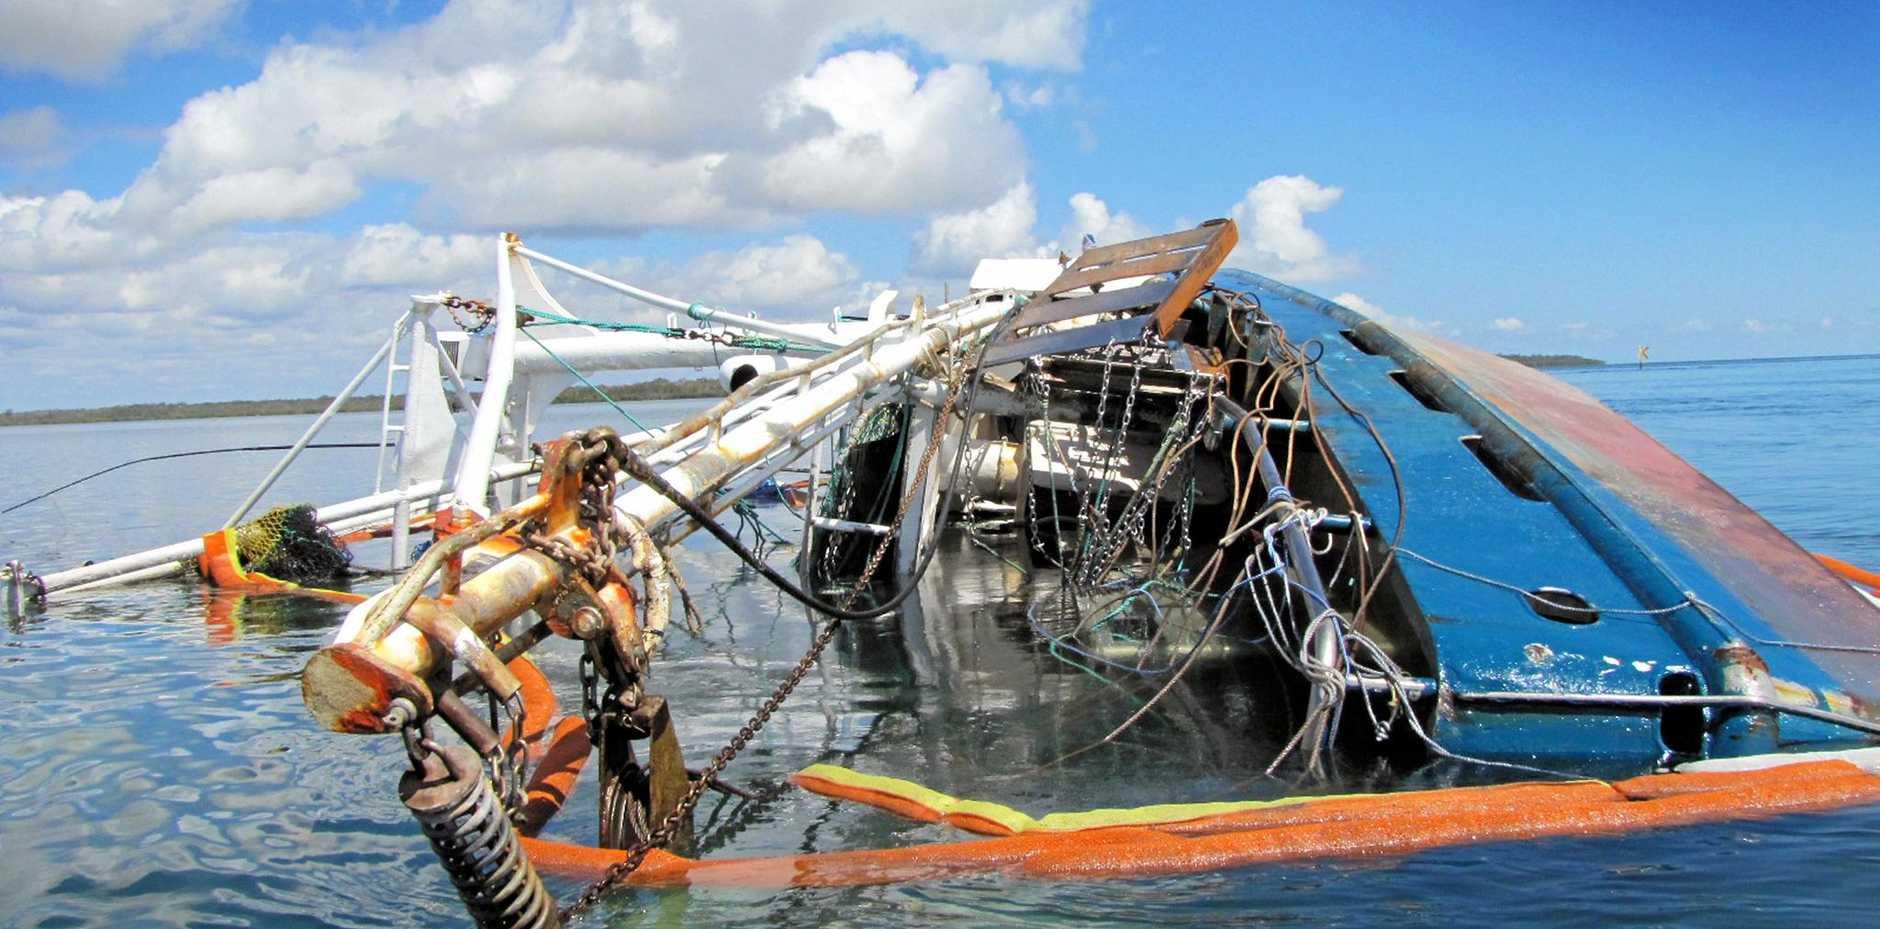 The Moray shipwreck off Tin Can Bay.    PHOTO: CASSIE CASSARAZZI - RAINBOW BEACH